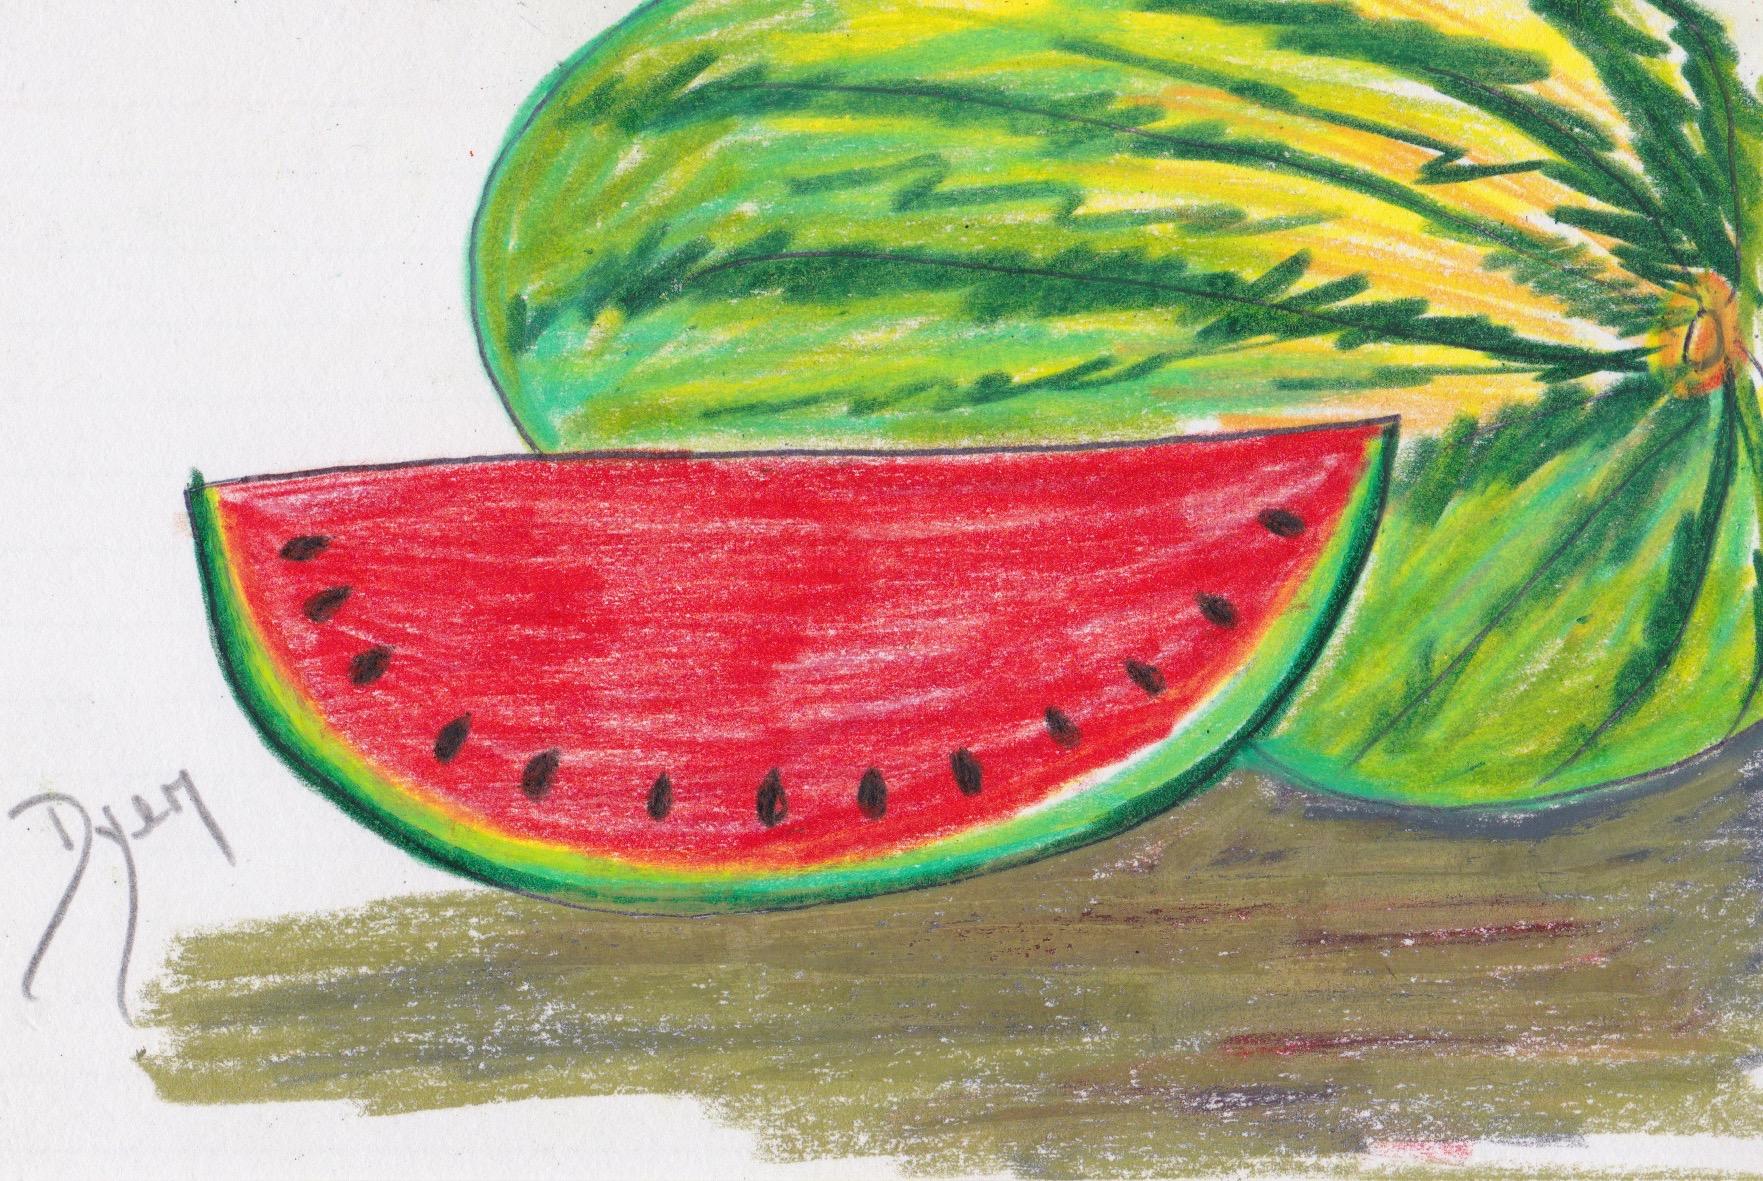 Index card watermelon.jpeg